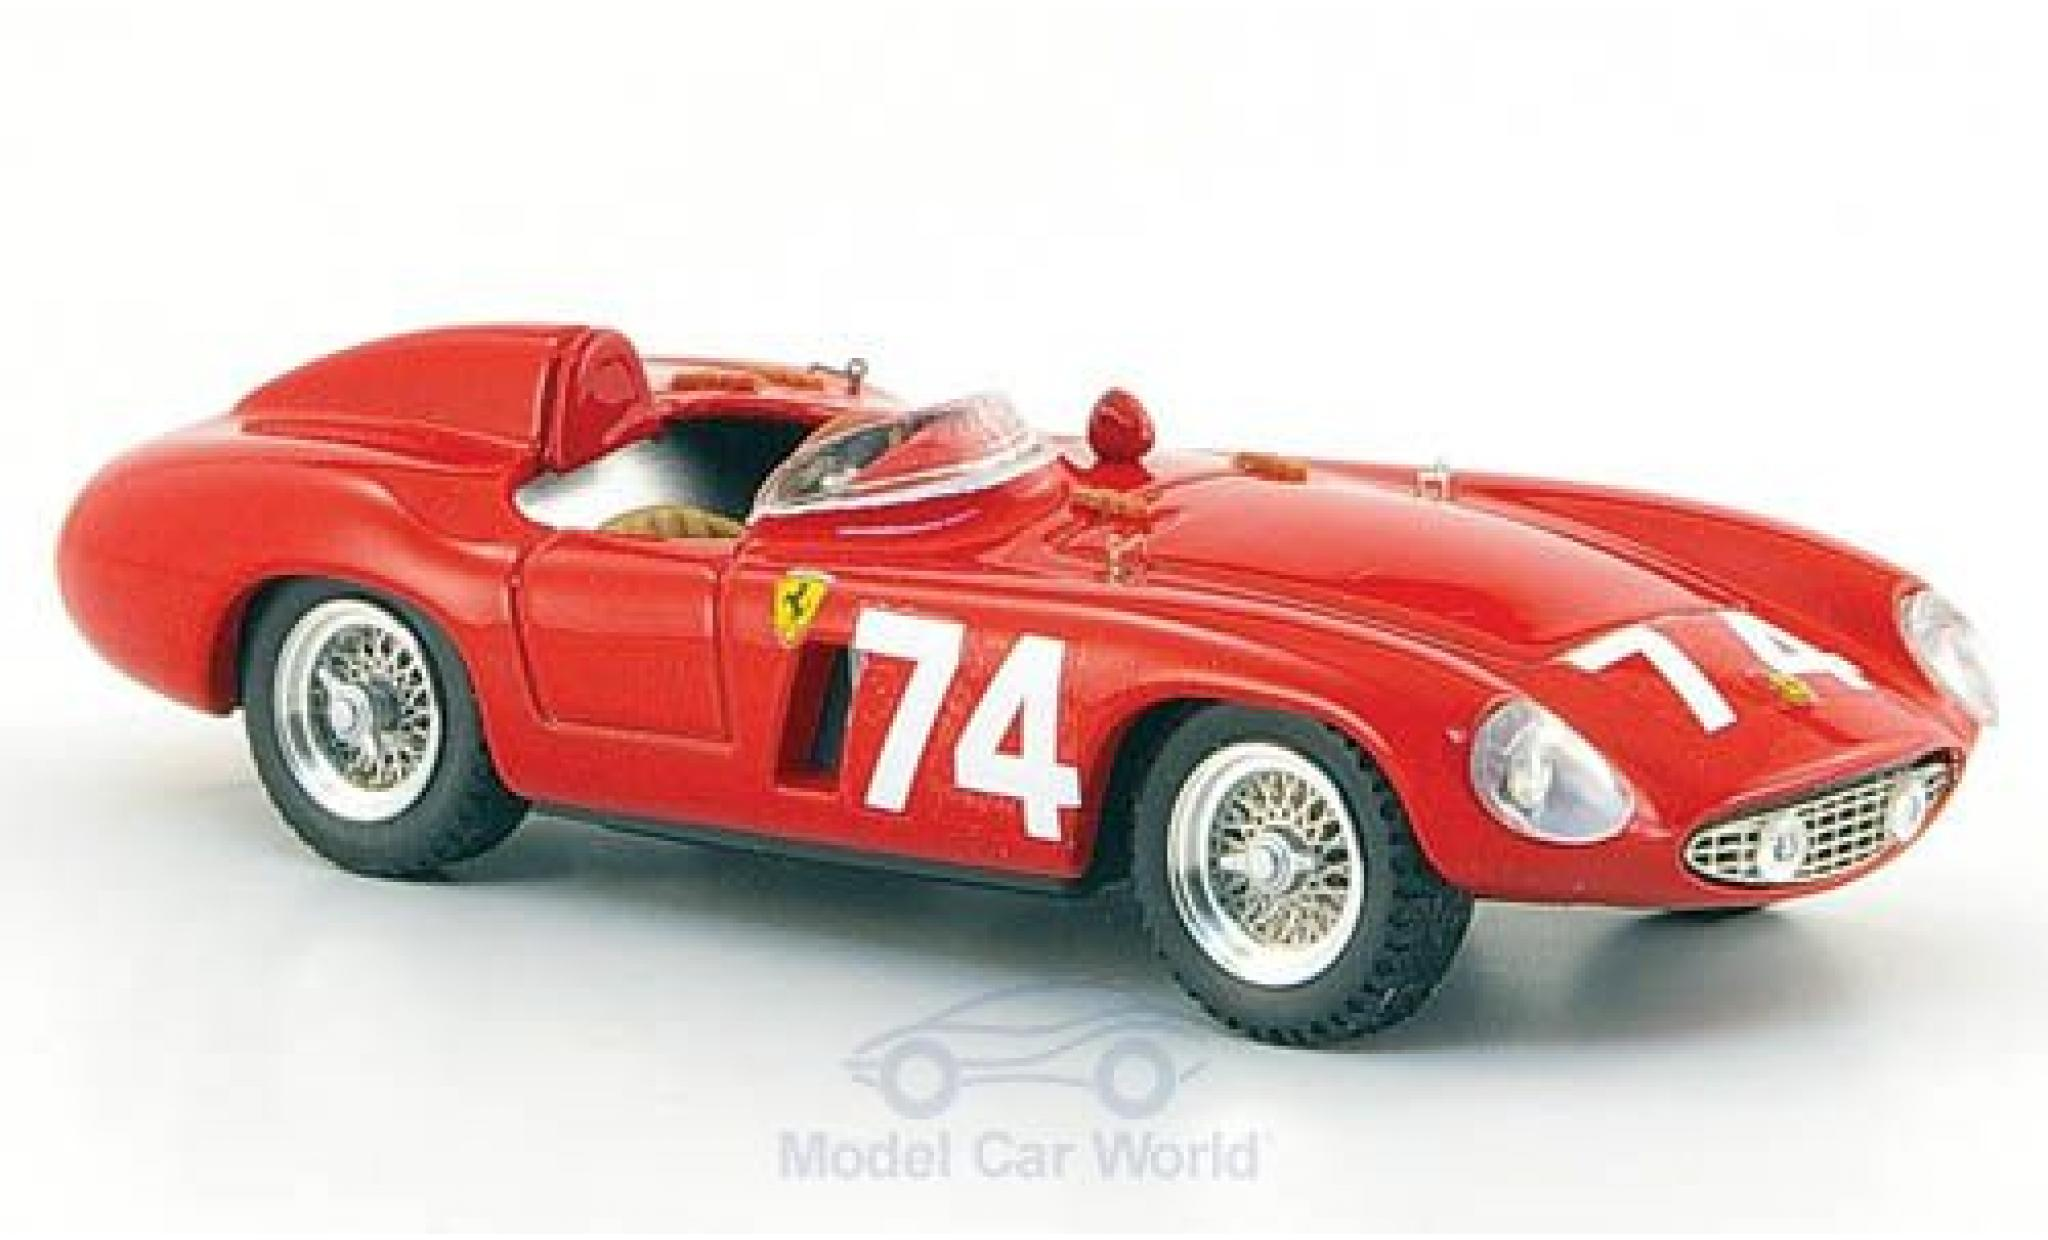 Ferrari 750 1955 1/43 Art Model Monza No.74 Targa Florio